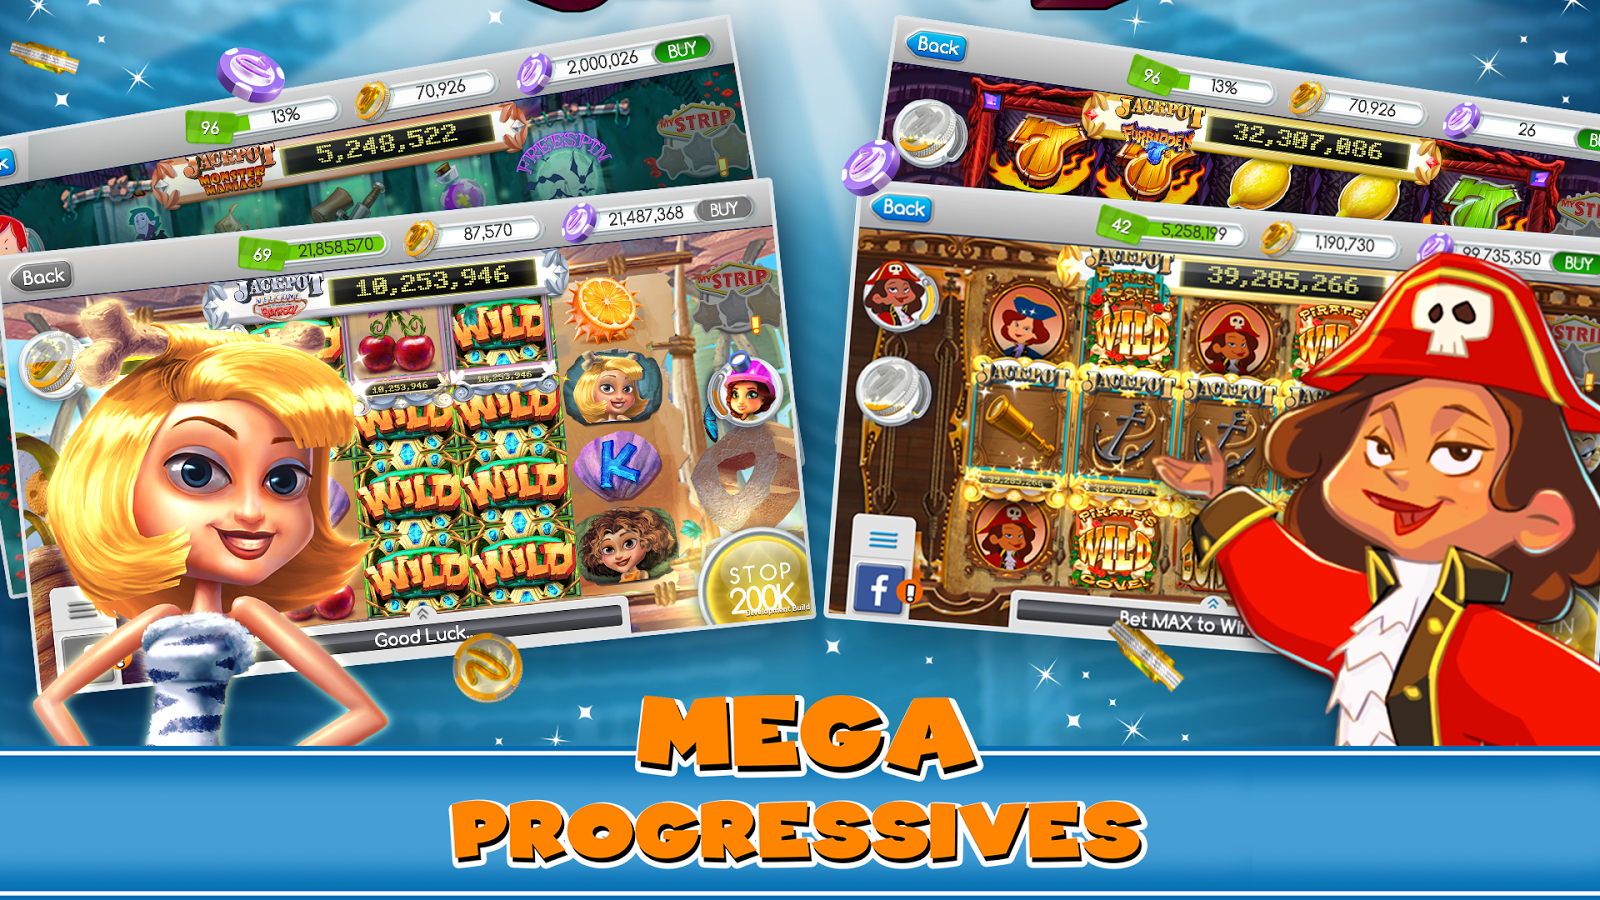 myVEGAS-Slots-Slots-Machines 24